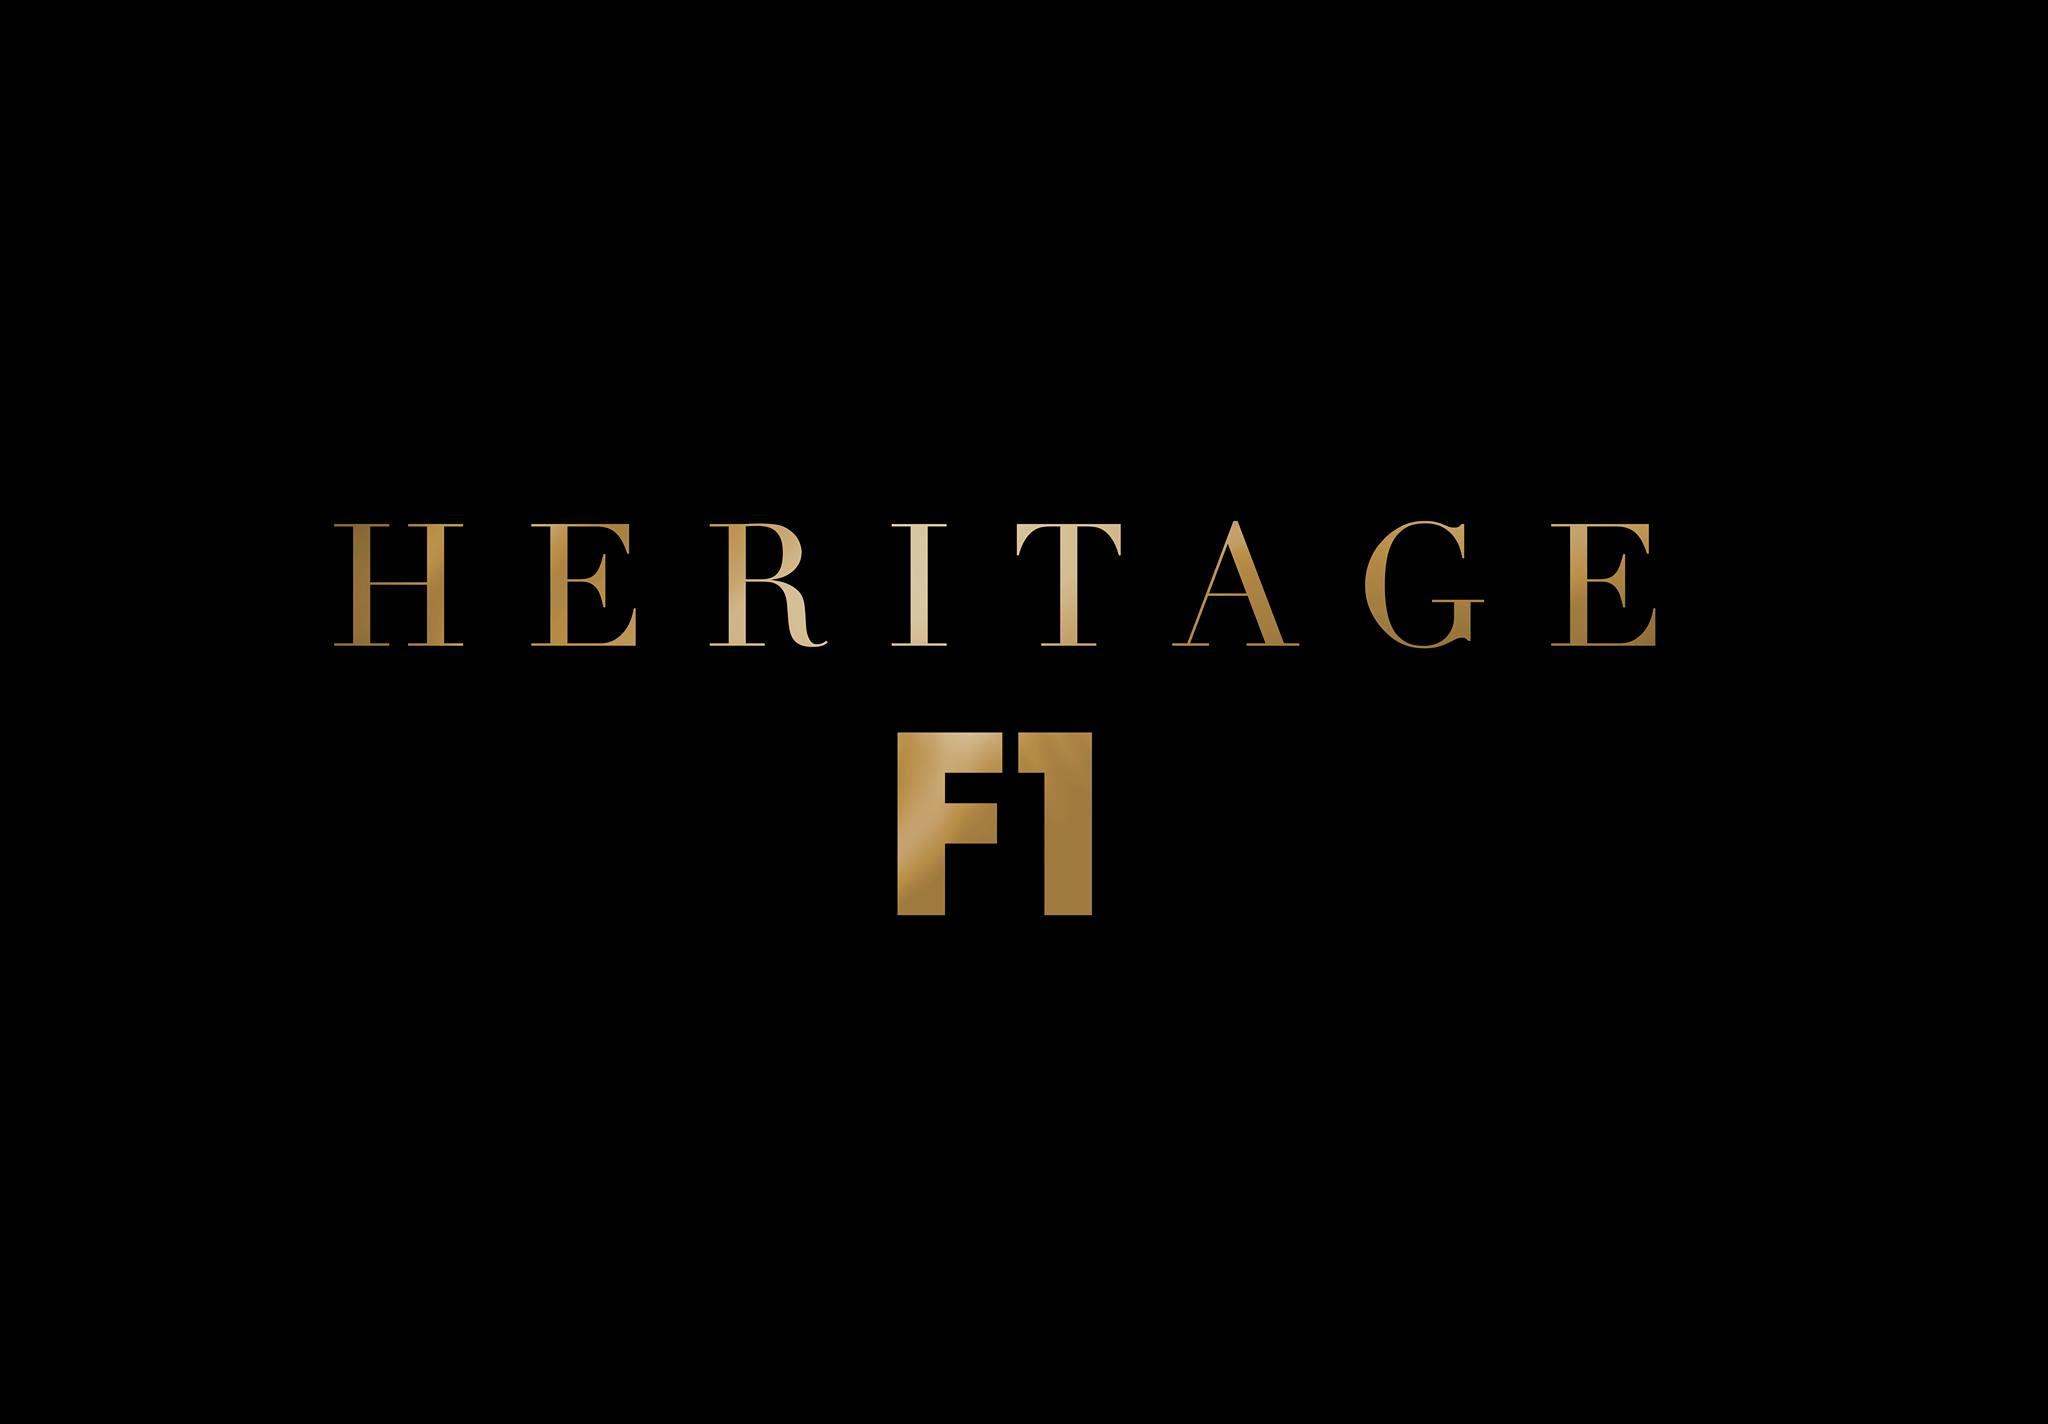 heritage f1- company logo